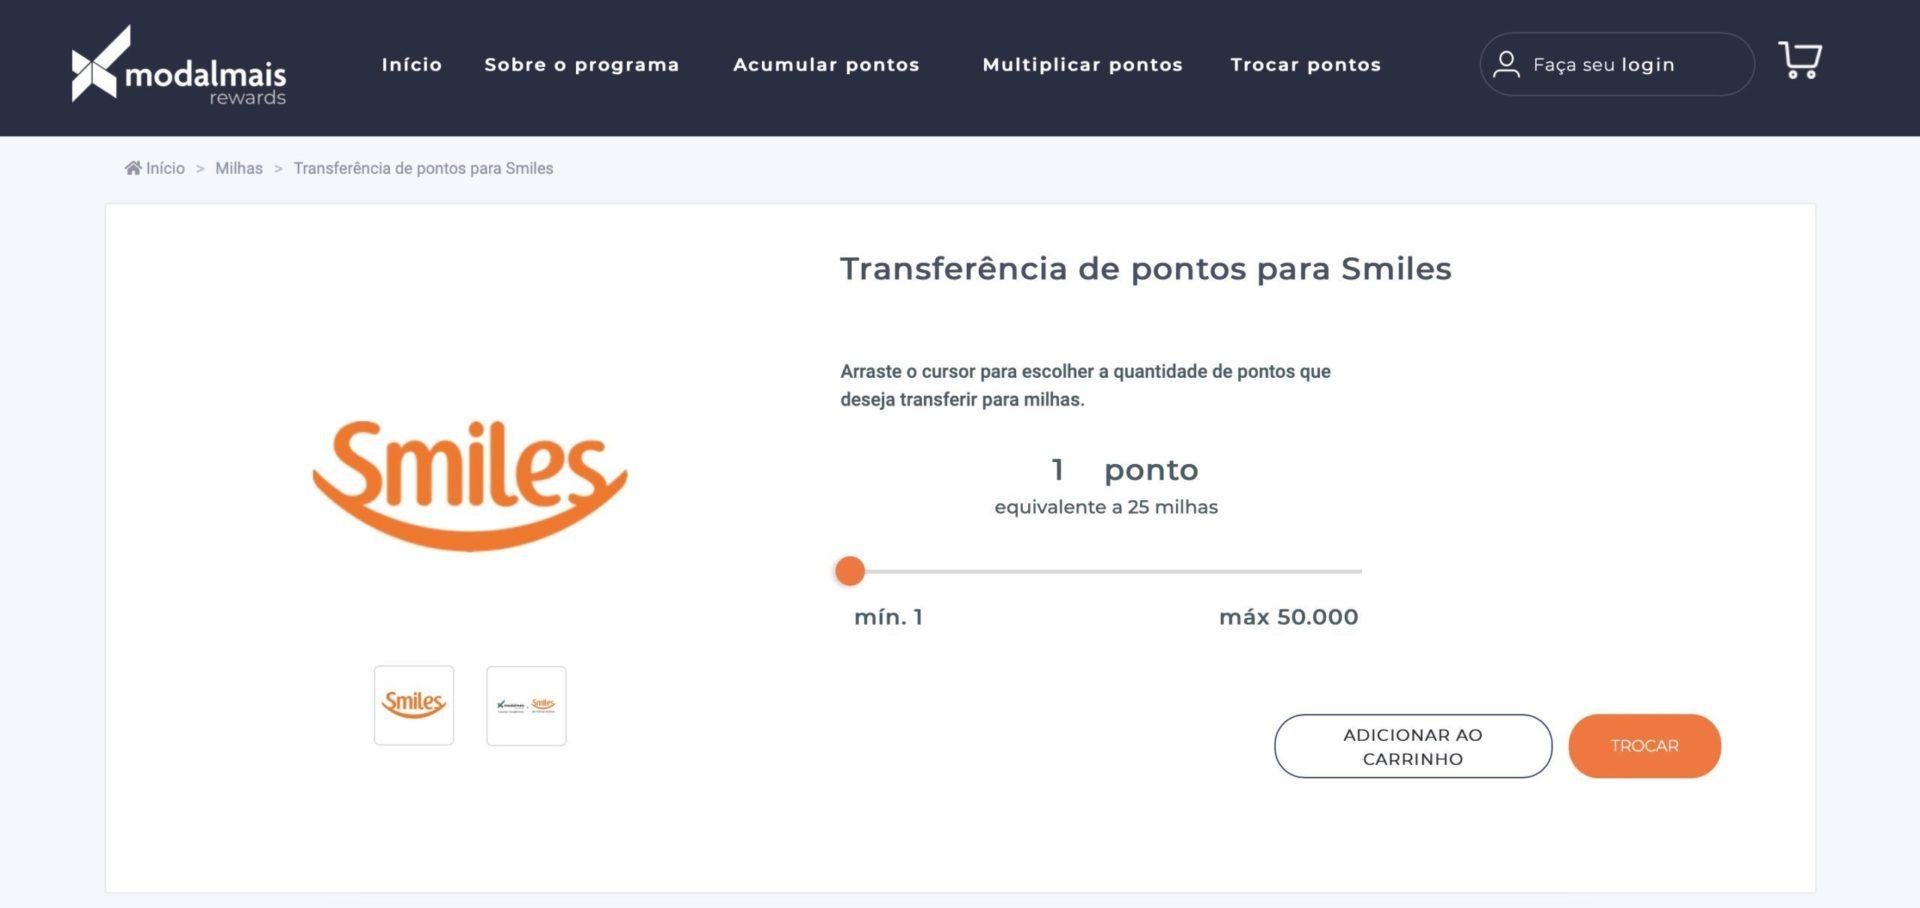 Smiles 200% bônus modalmais